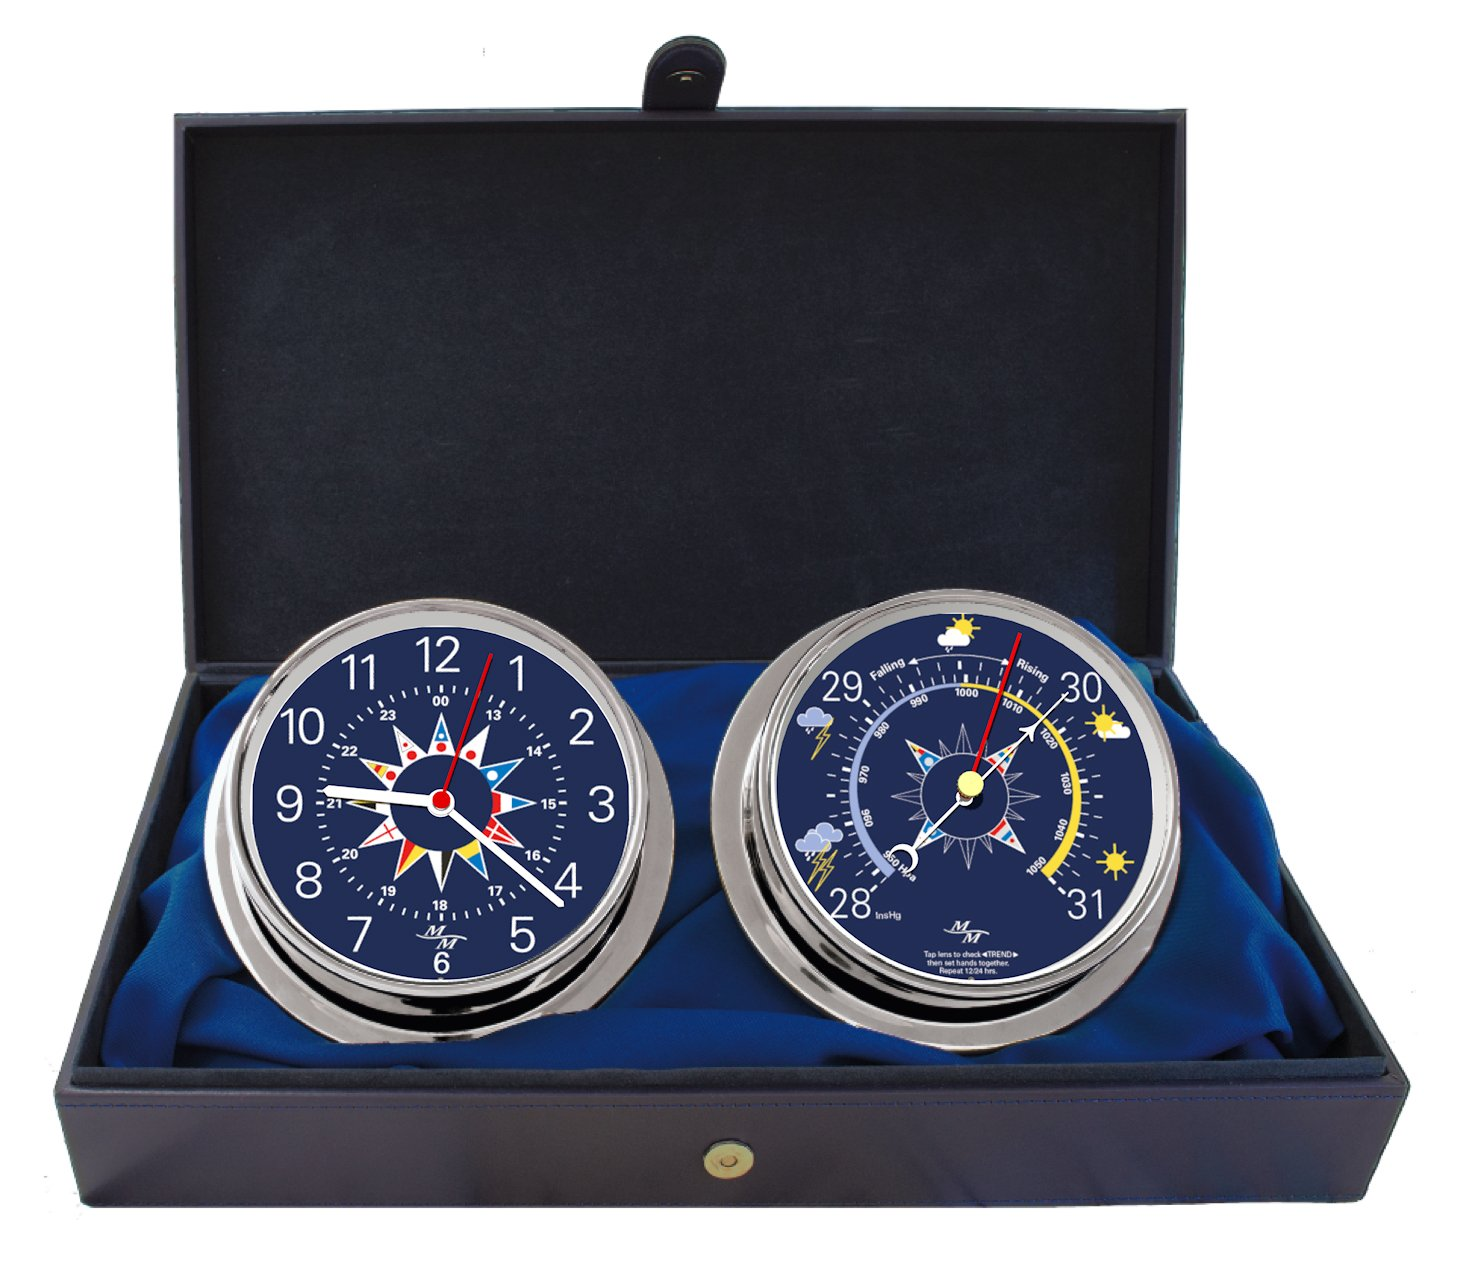 Cabin Gift Set Clock & Barometer by Master-Mariner, Chrome finish, Blue flag dial